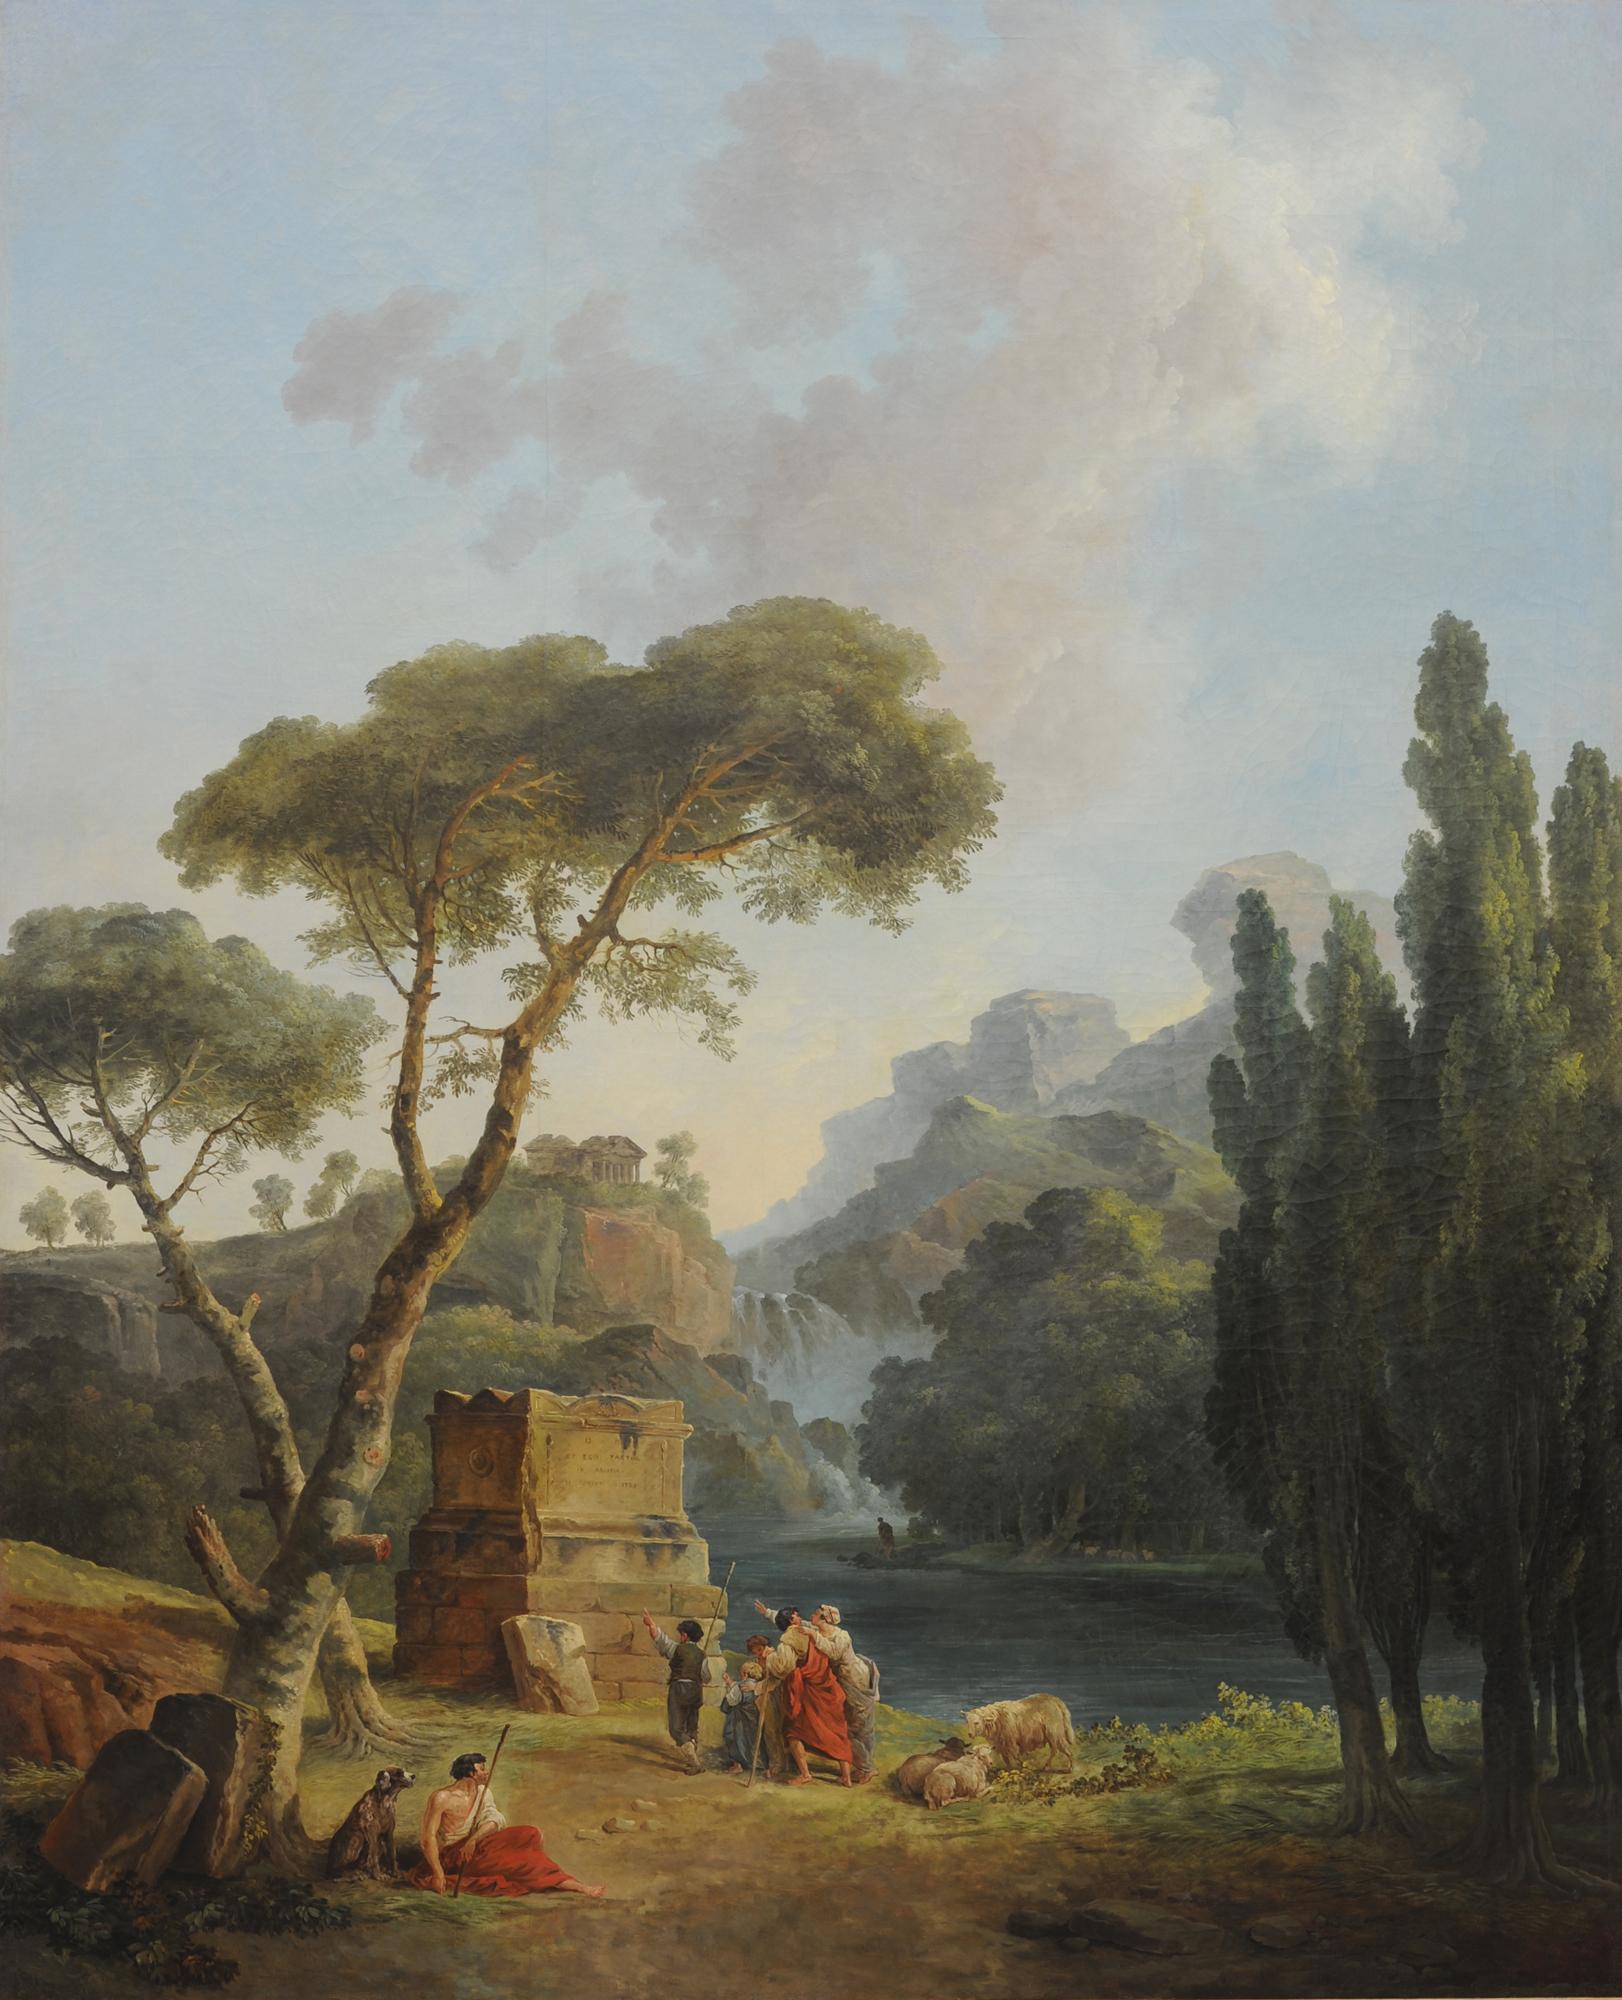 Hubert Robert - Les bergers d'Arcadie © Musée de Valence, photo Éric Caillet